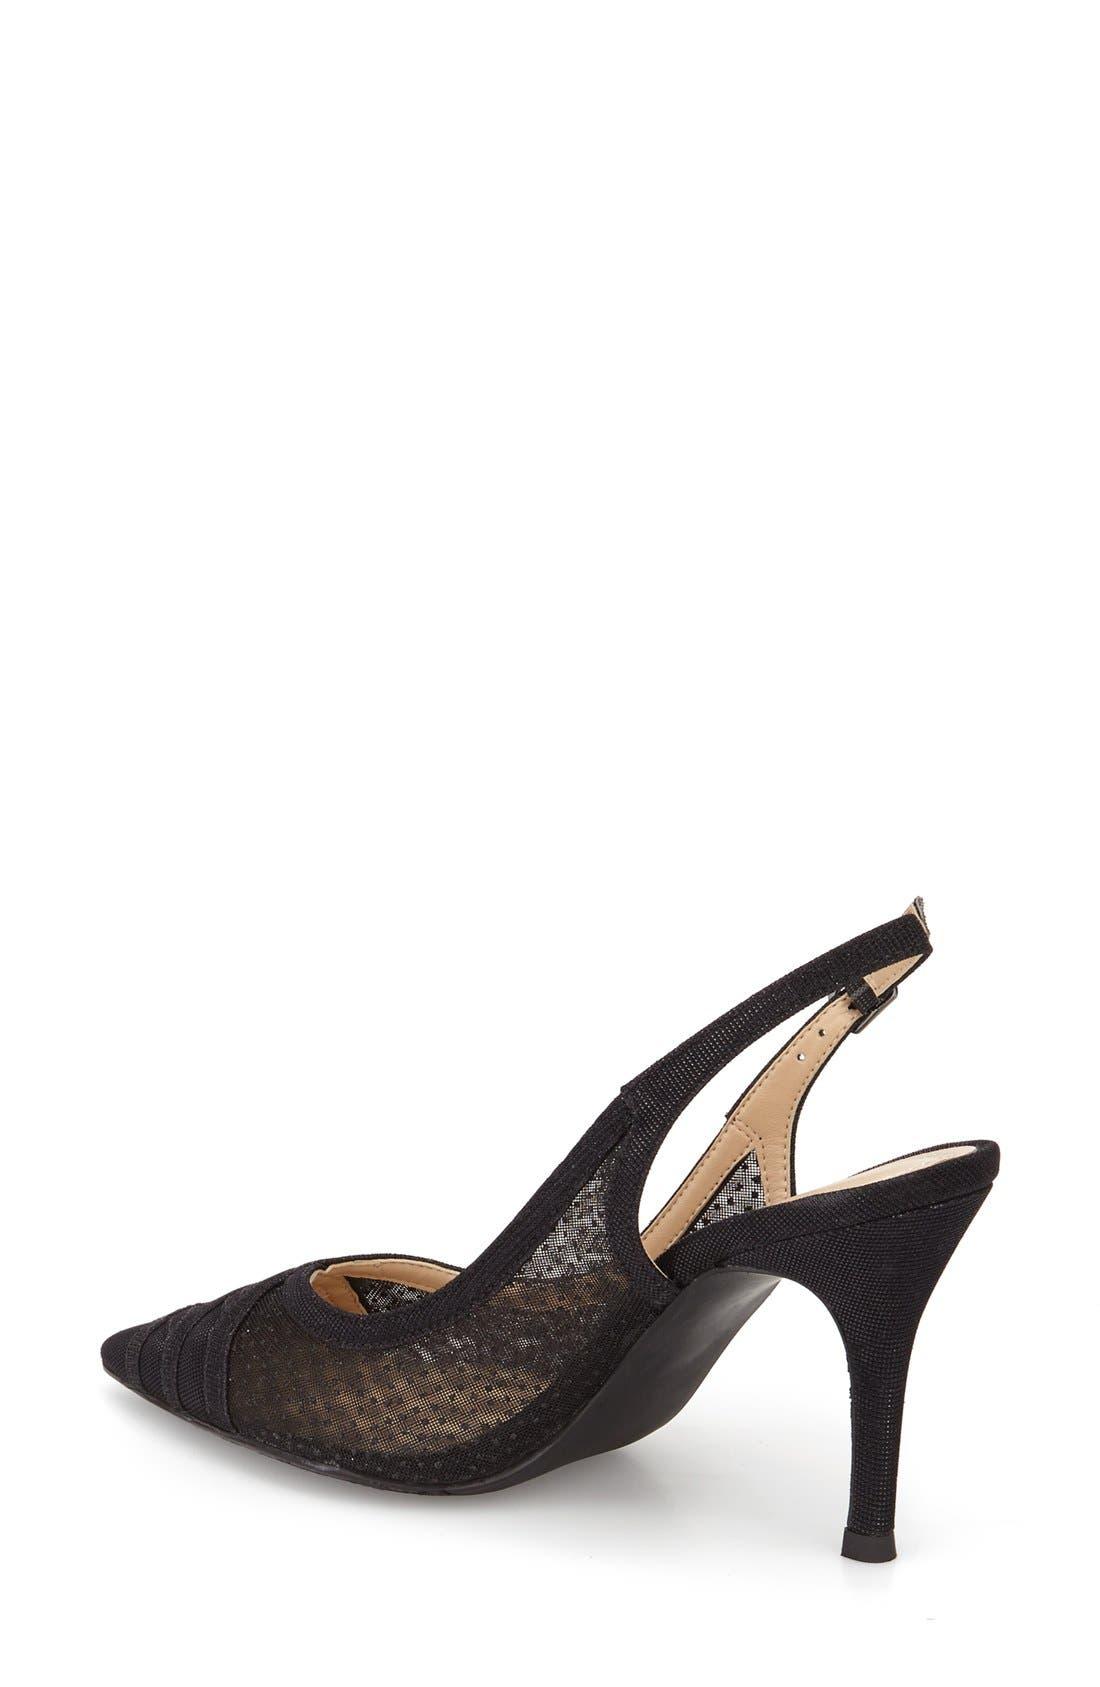 J. Renee Savina Pointed Toe Slingback Pump,                             Alternate thumbnail 2, color,                             Black Glitter